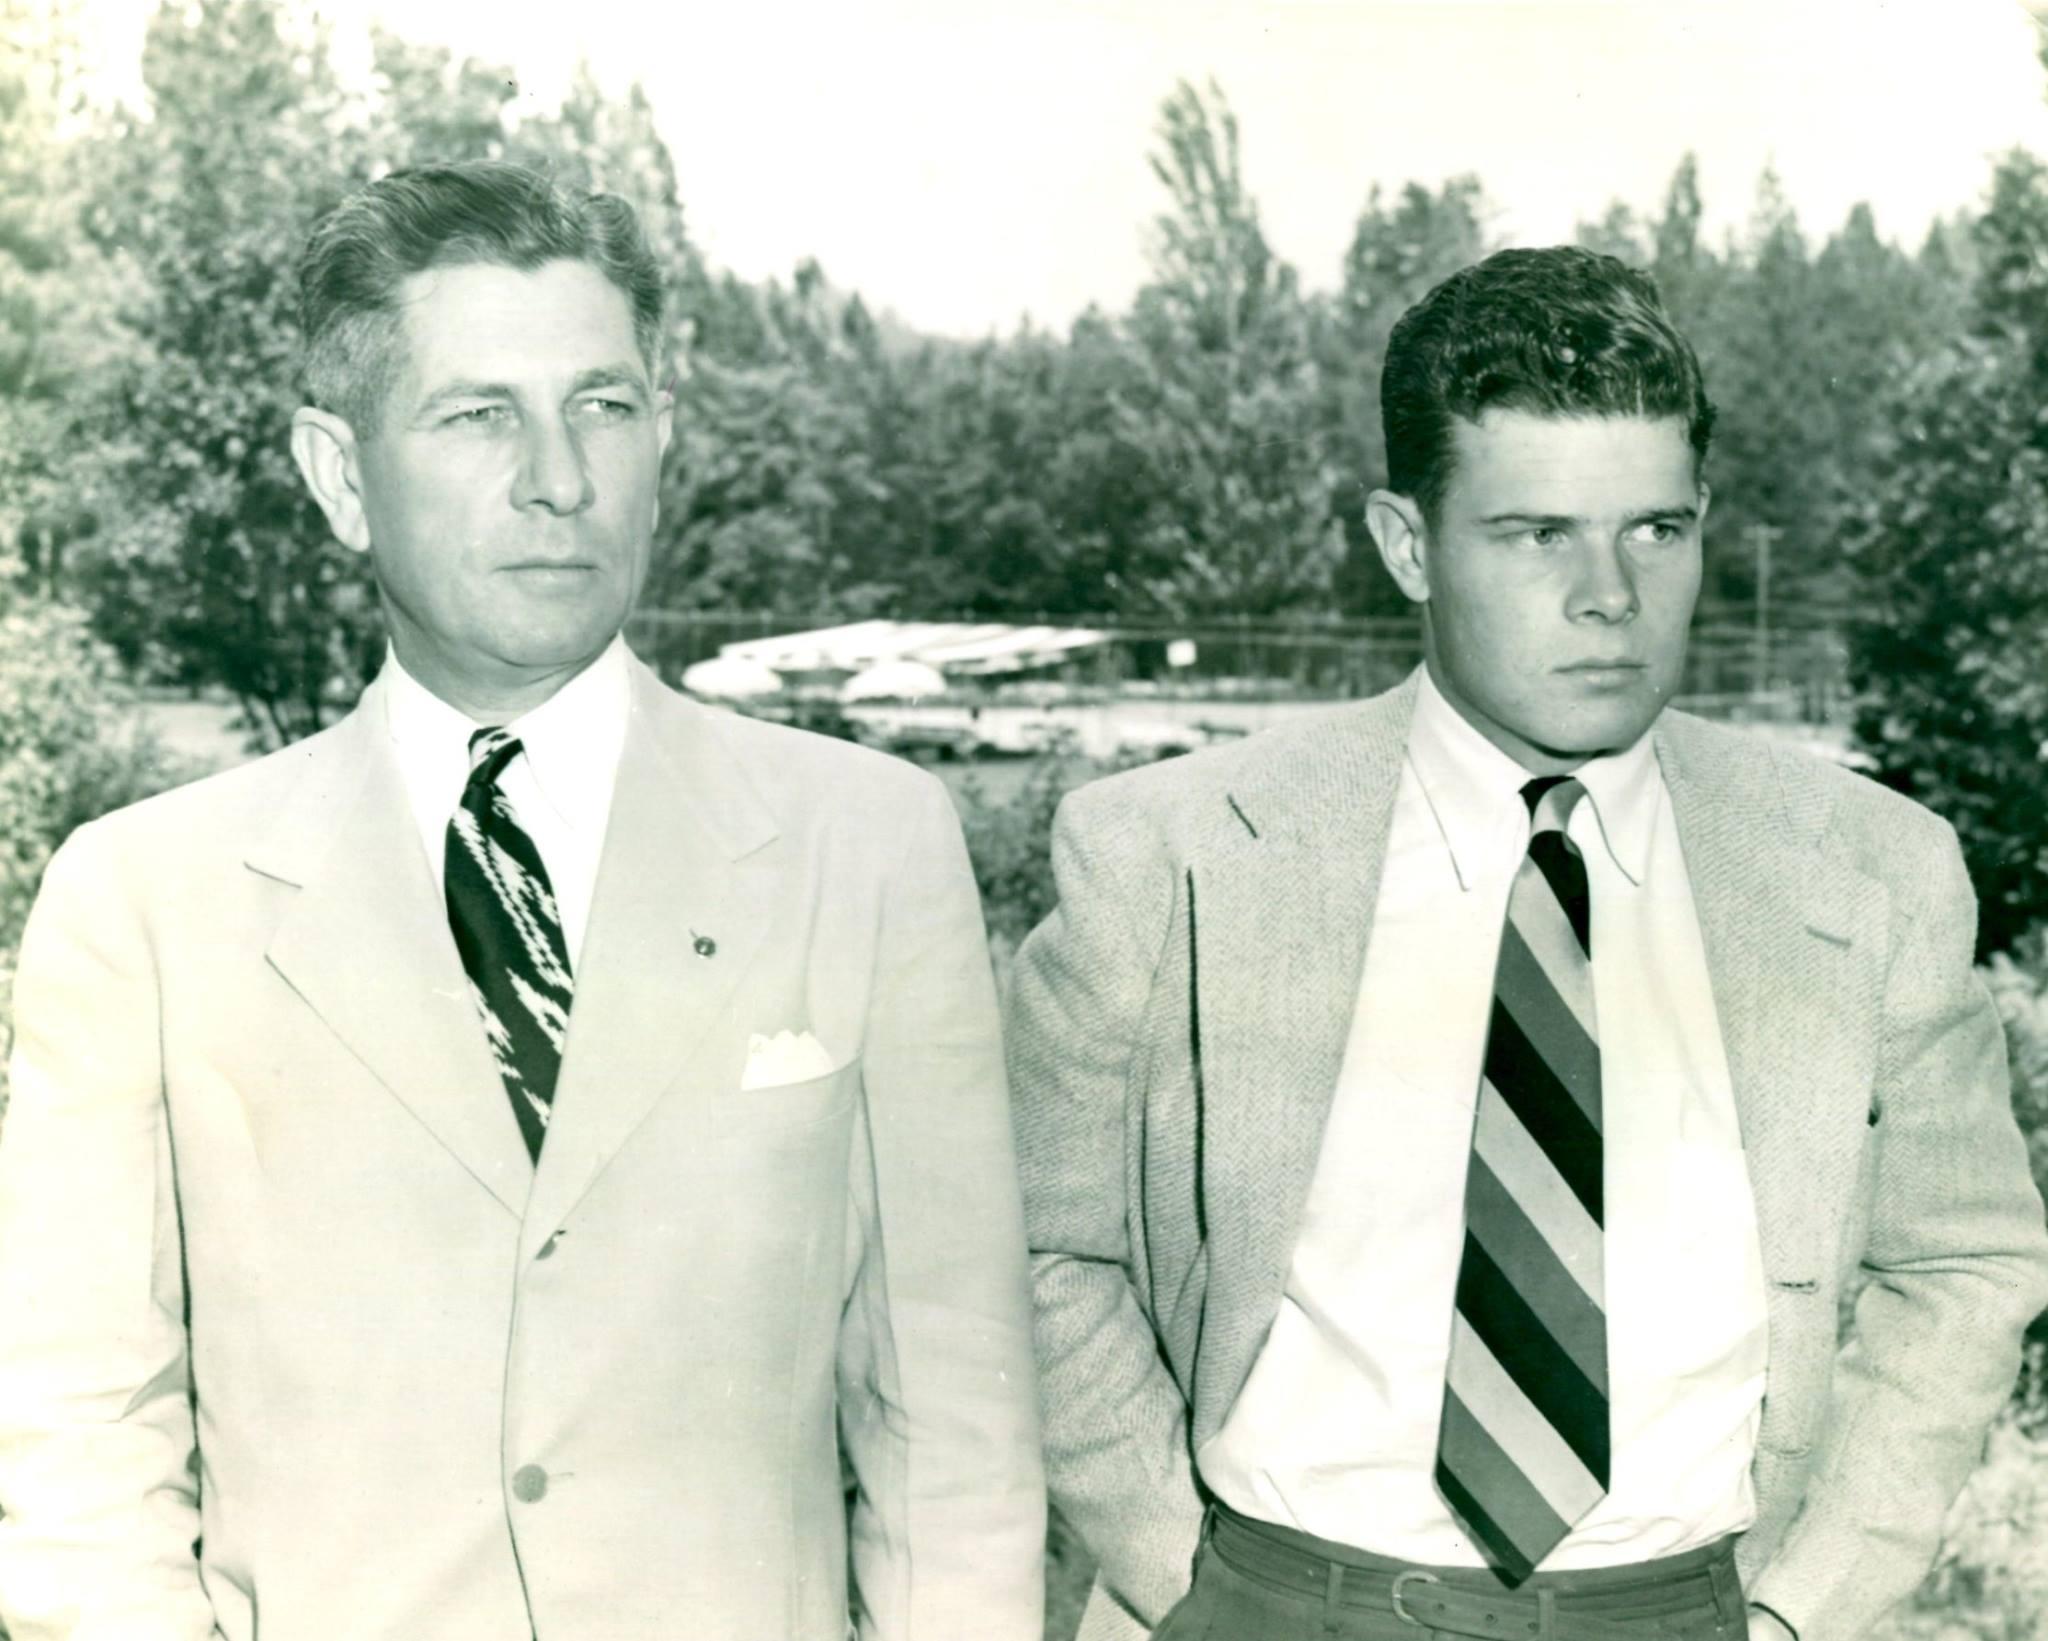 Earl Coffman with his son, Owen Coffman